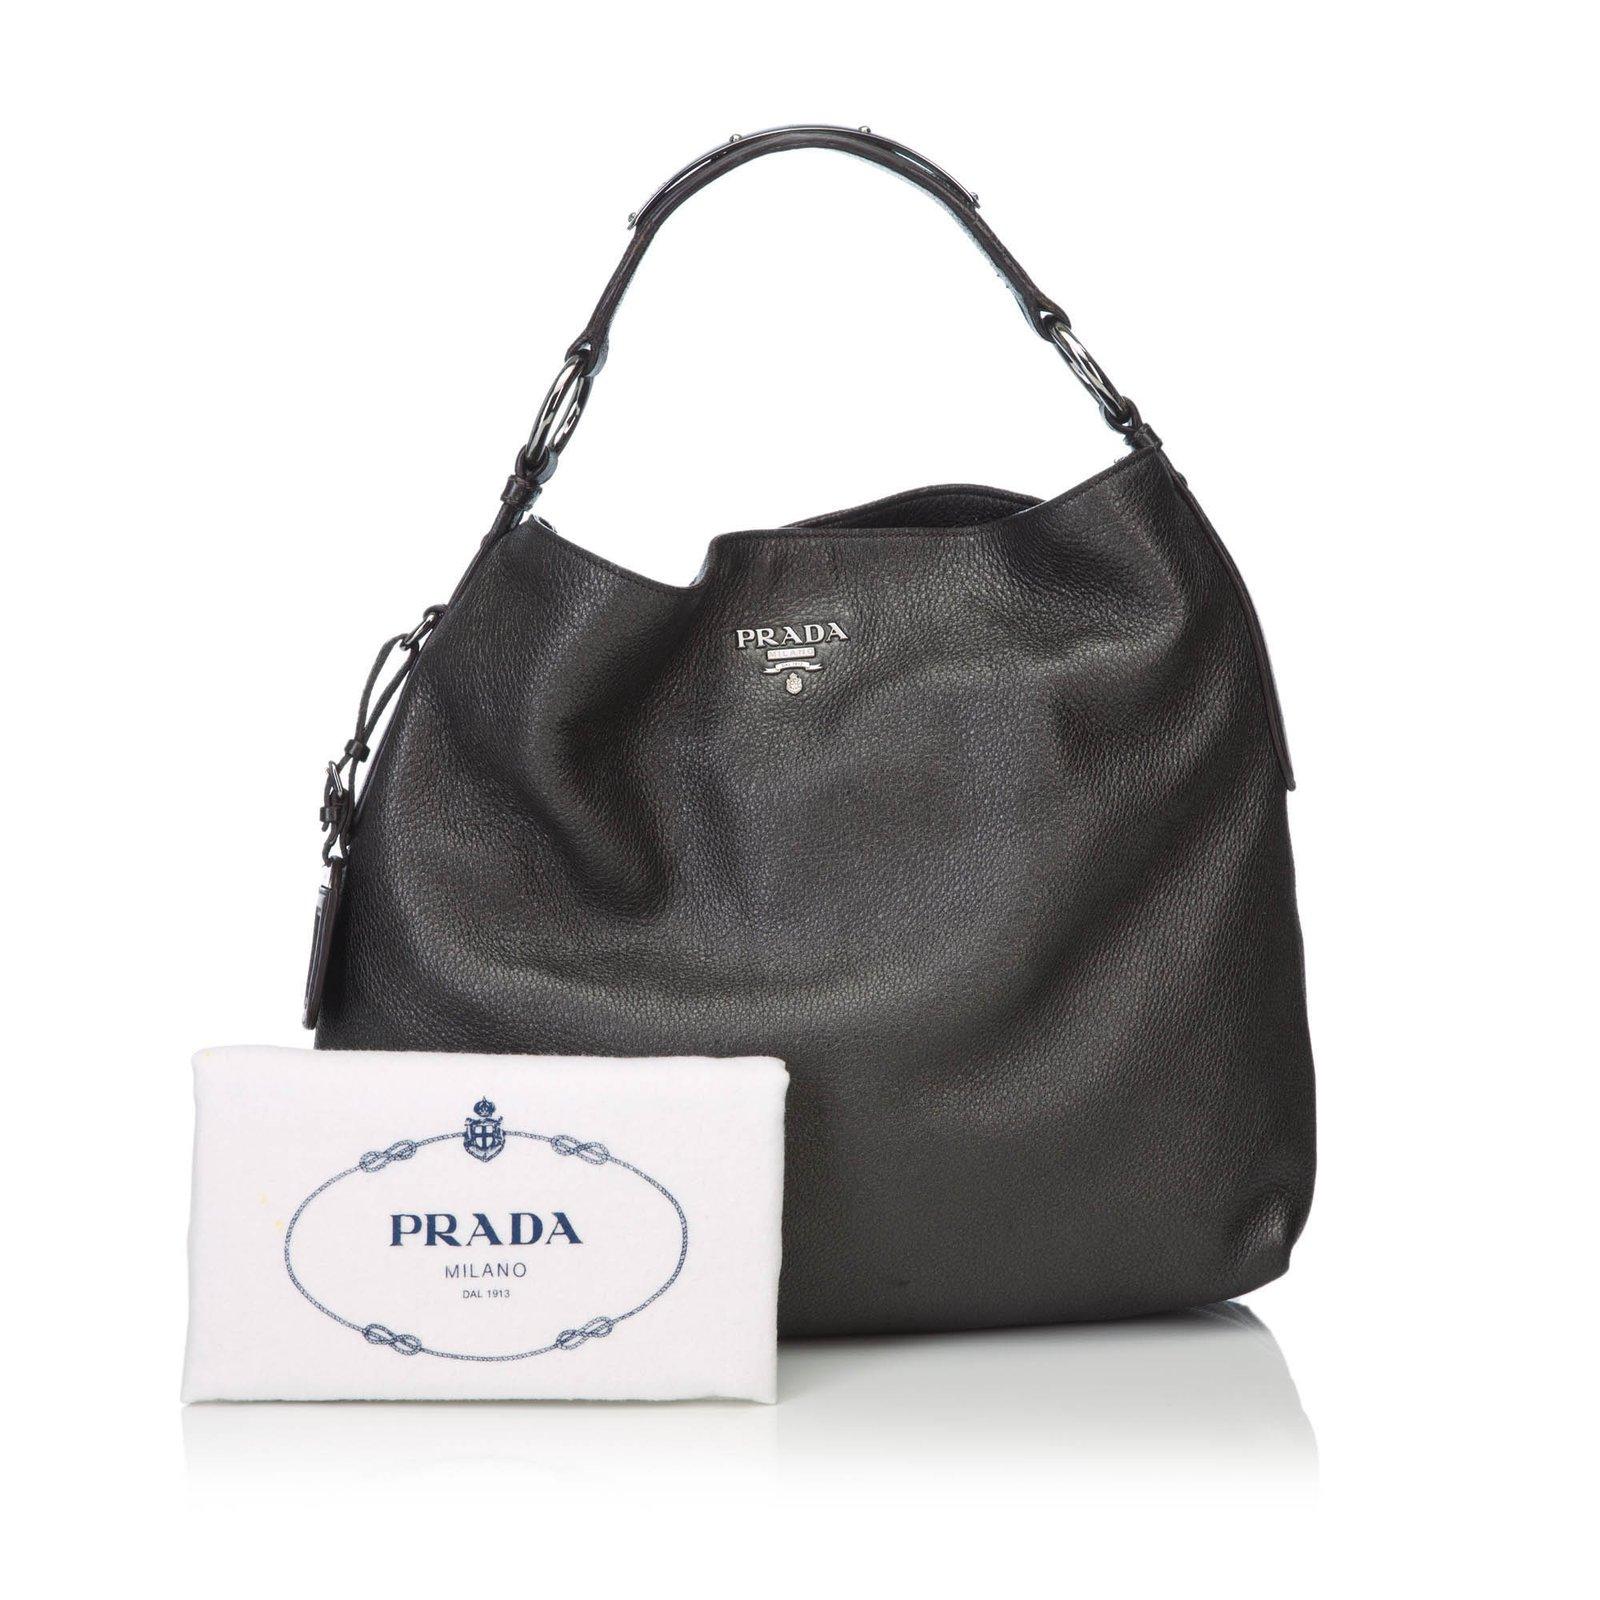 be1a4b5ea895 Prada Leather Hobo Handbags Leather,Other Grey ref.82092 - Joli Closet